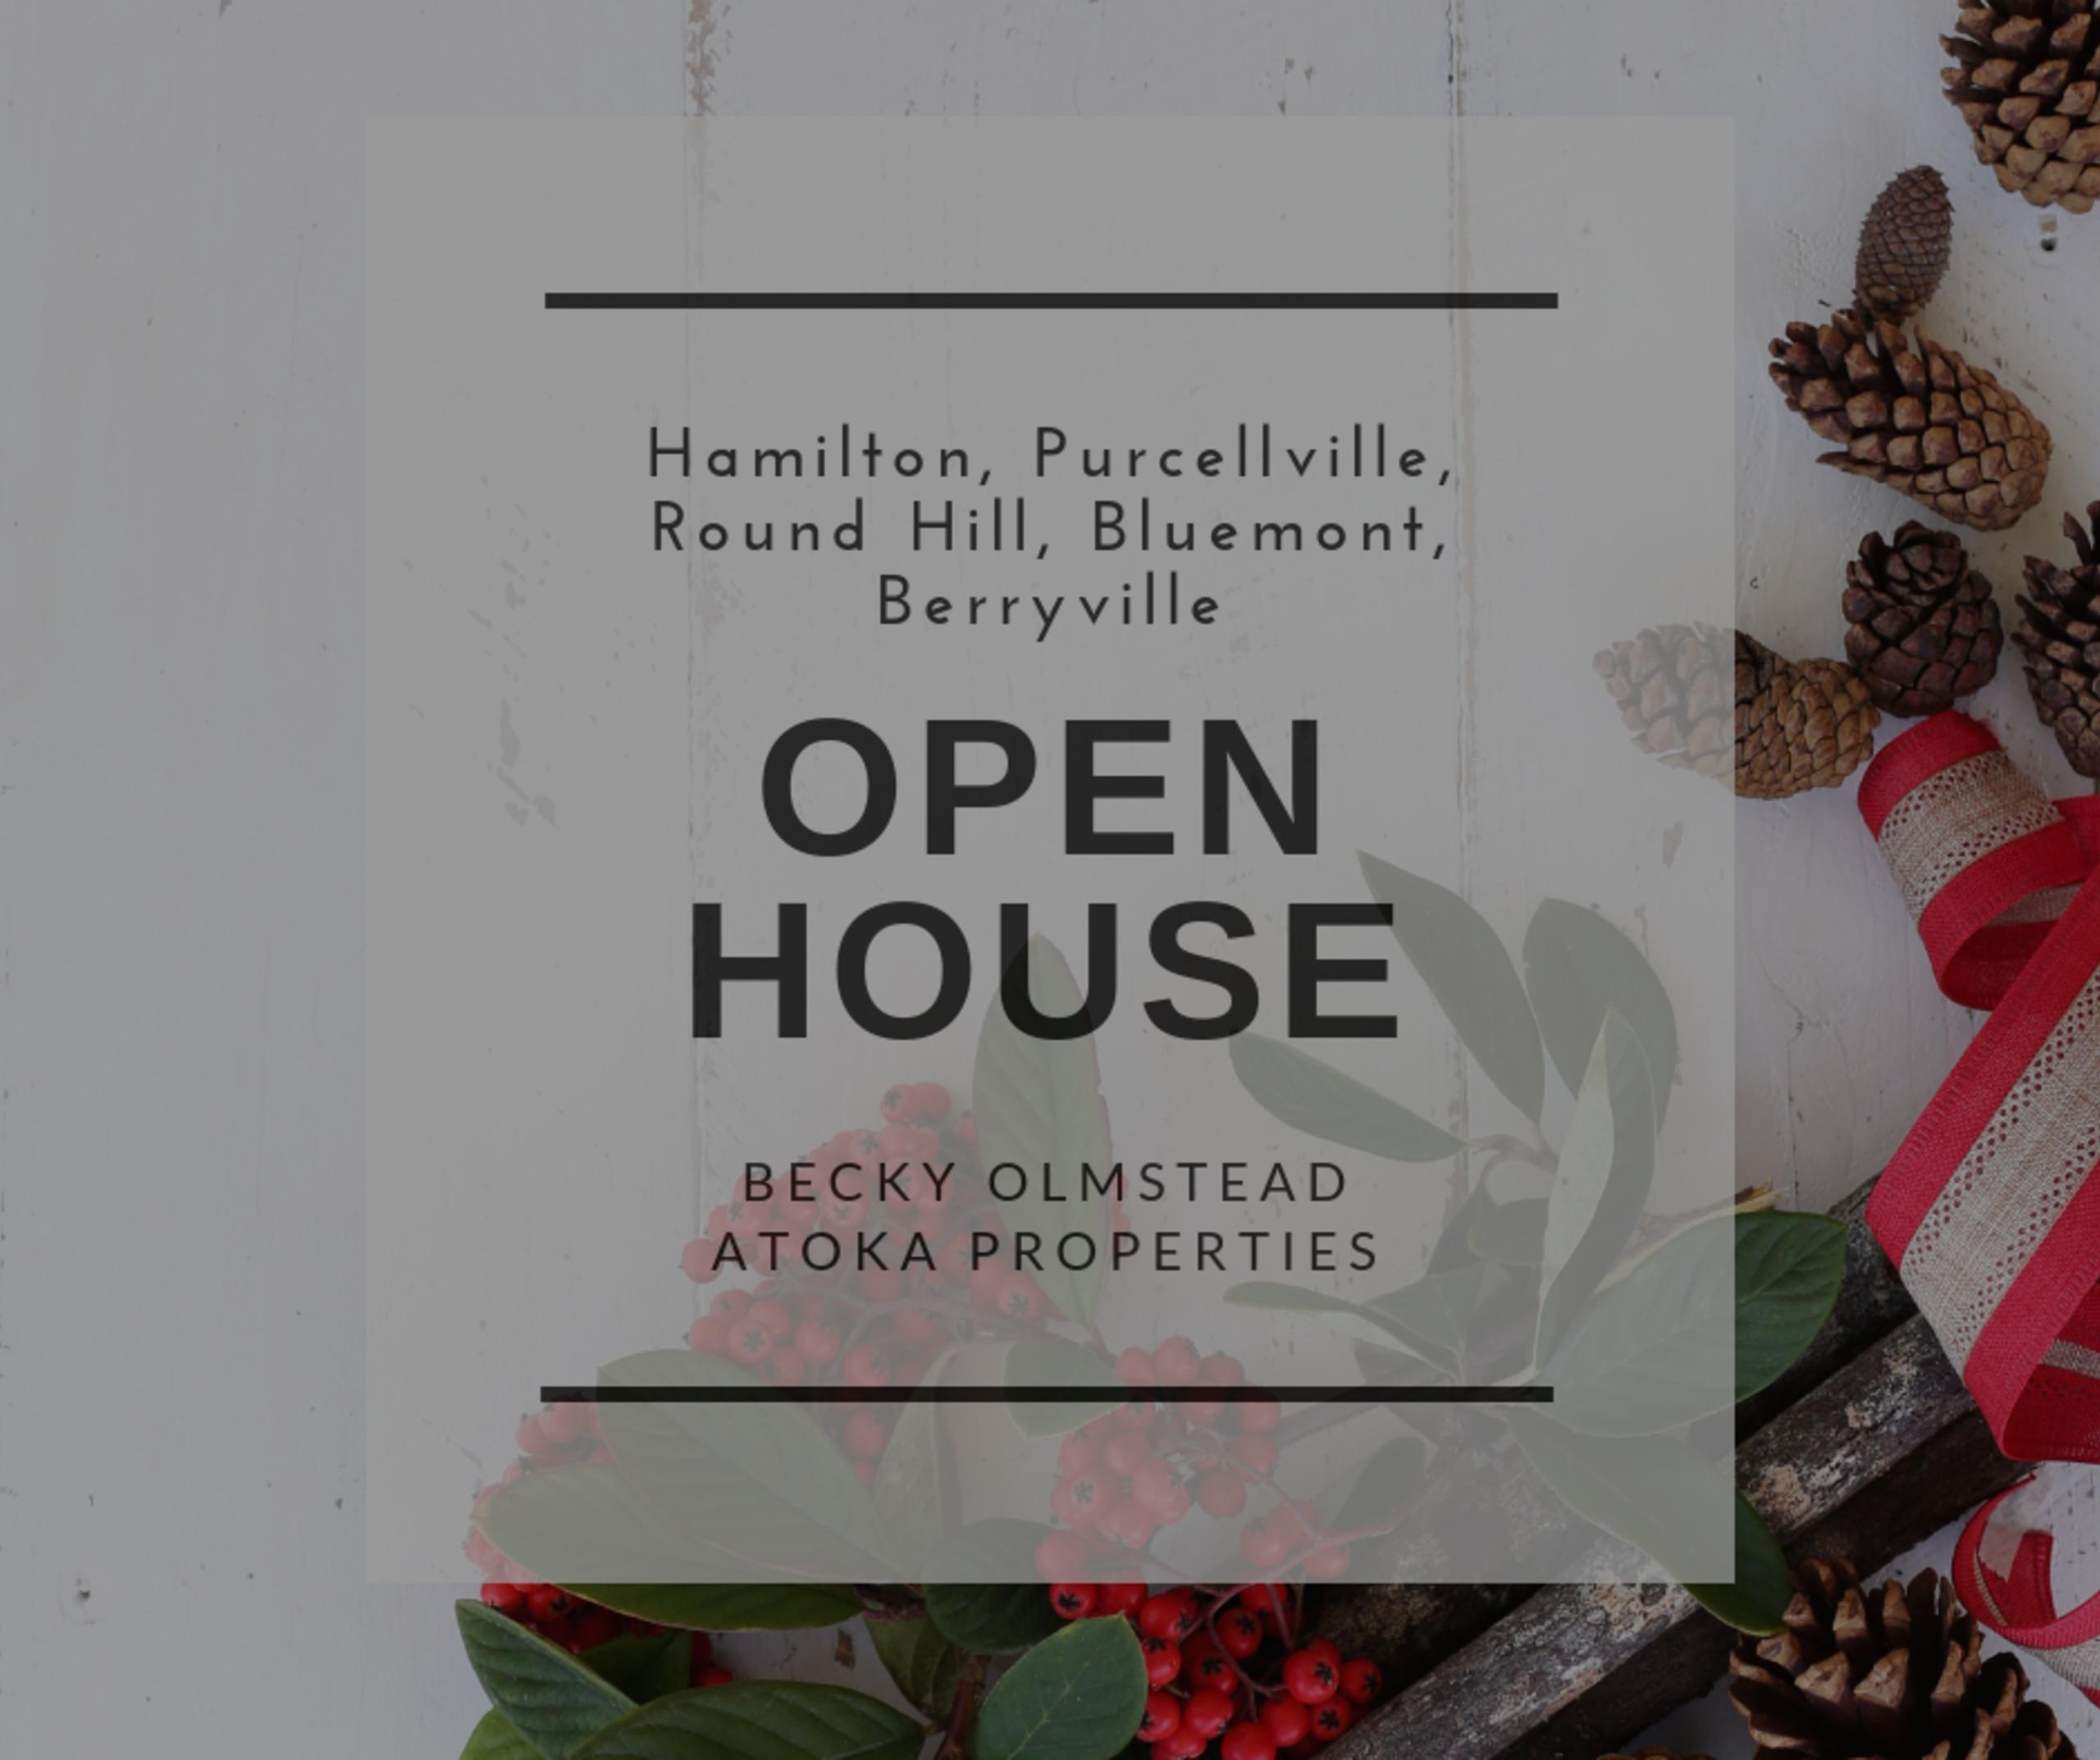 Open House 12/1/18 – 12/2/18